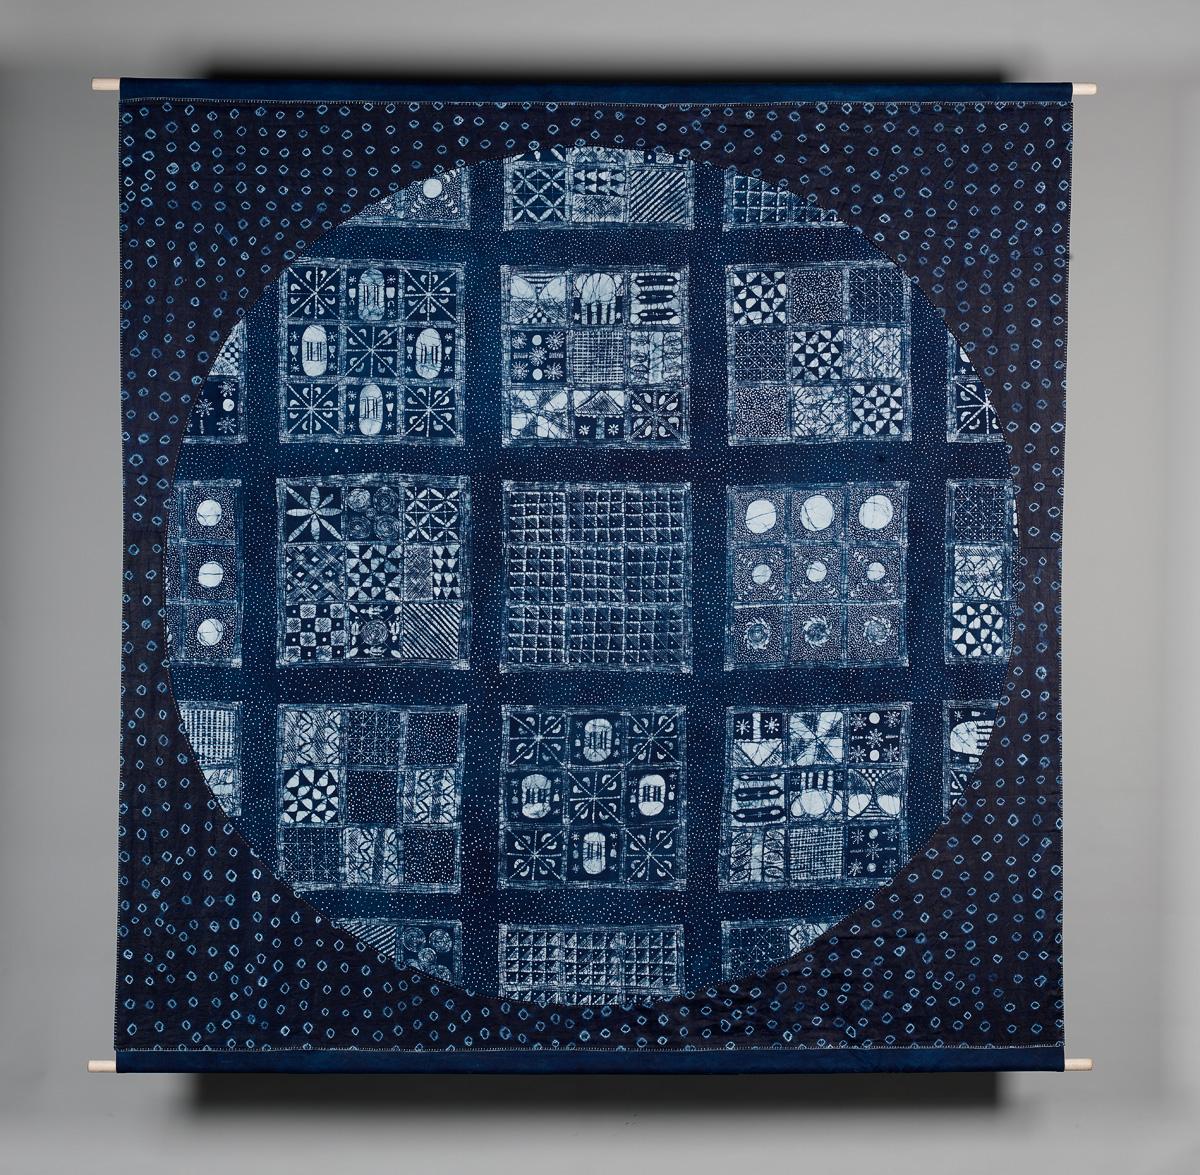 'Adire (Indigo Songs)', by Oluwole Oginni & Simone Tippett, indigo & appliqué, 2013